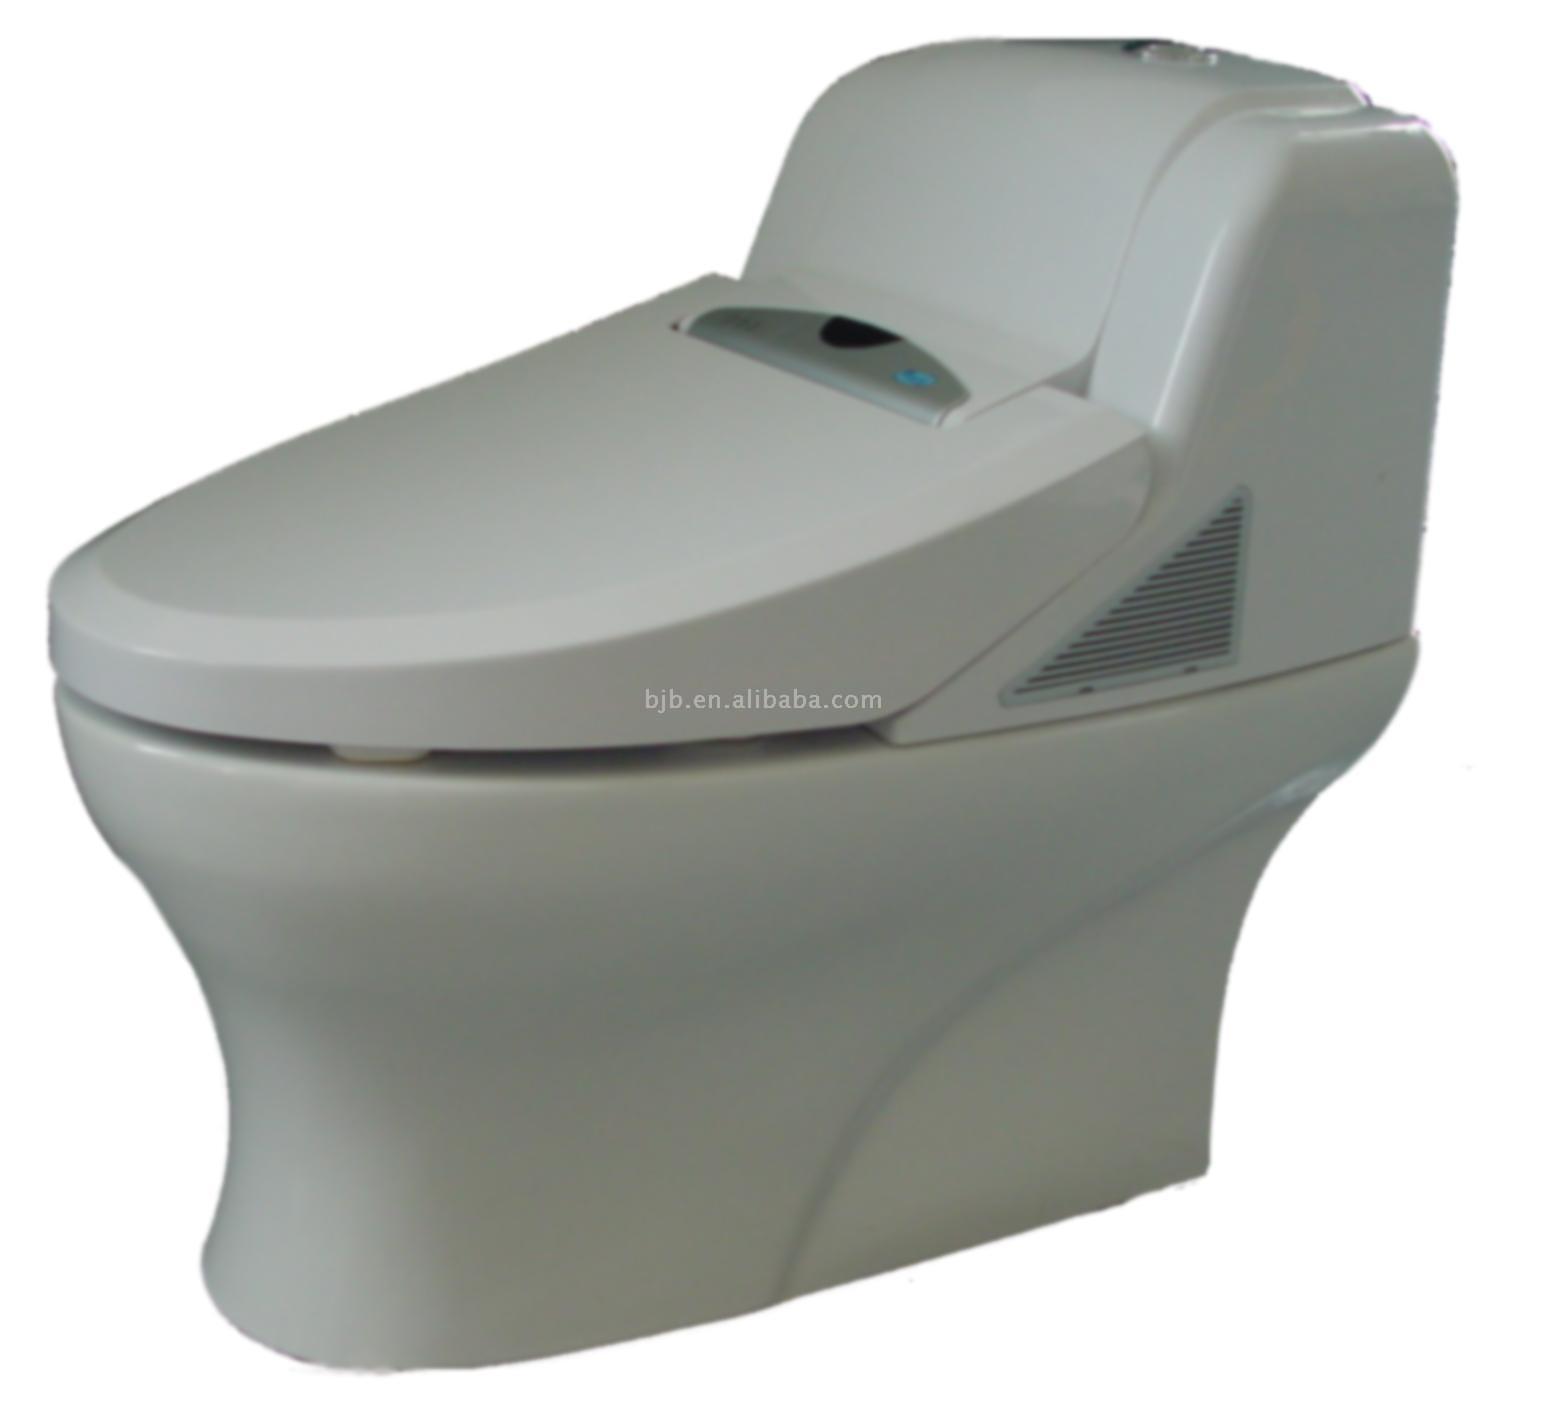 Computerized Toilet Seat ( Computerized Toilet Seat)